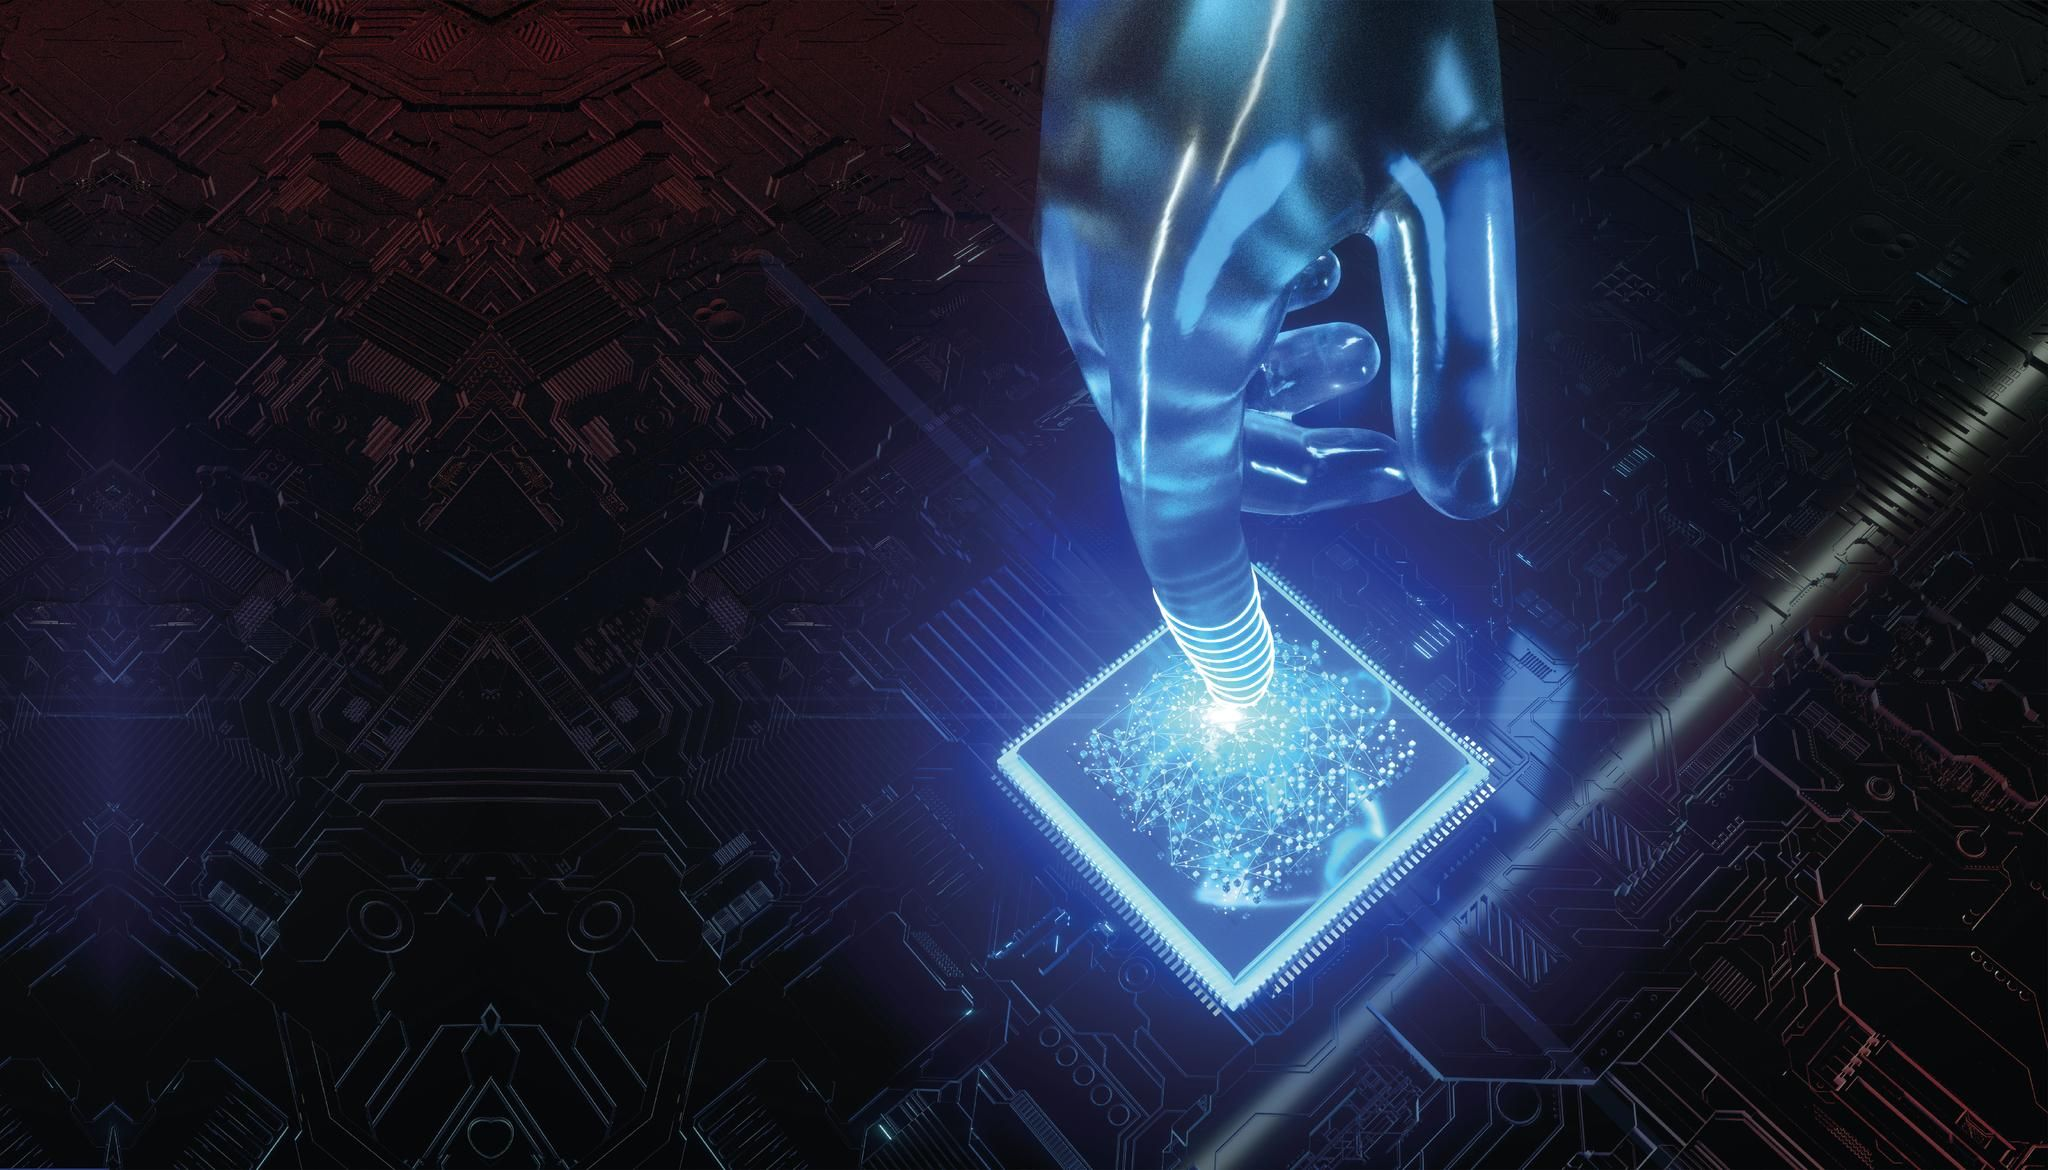 2020 technology